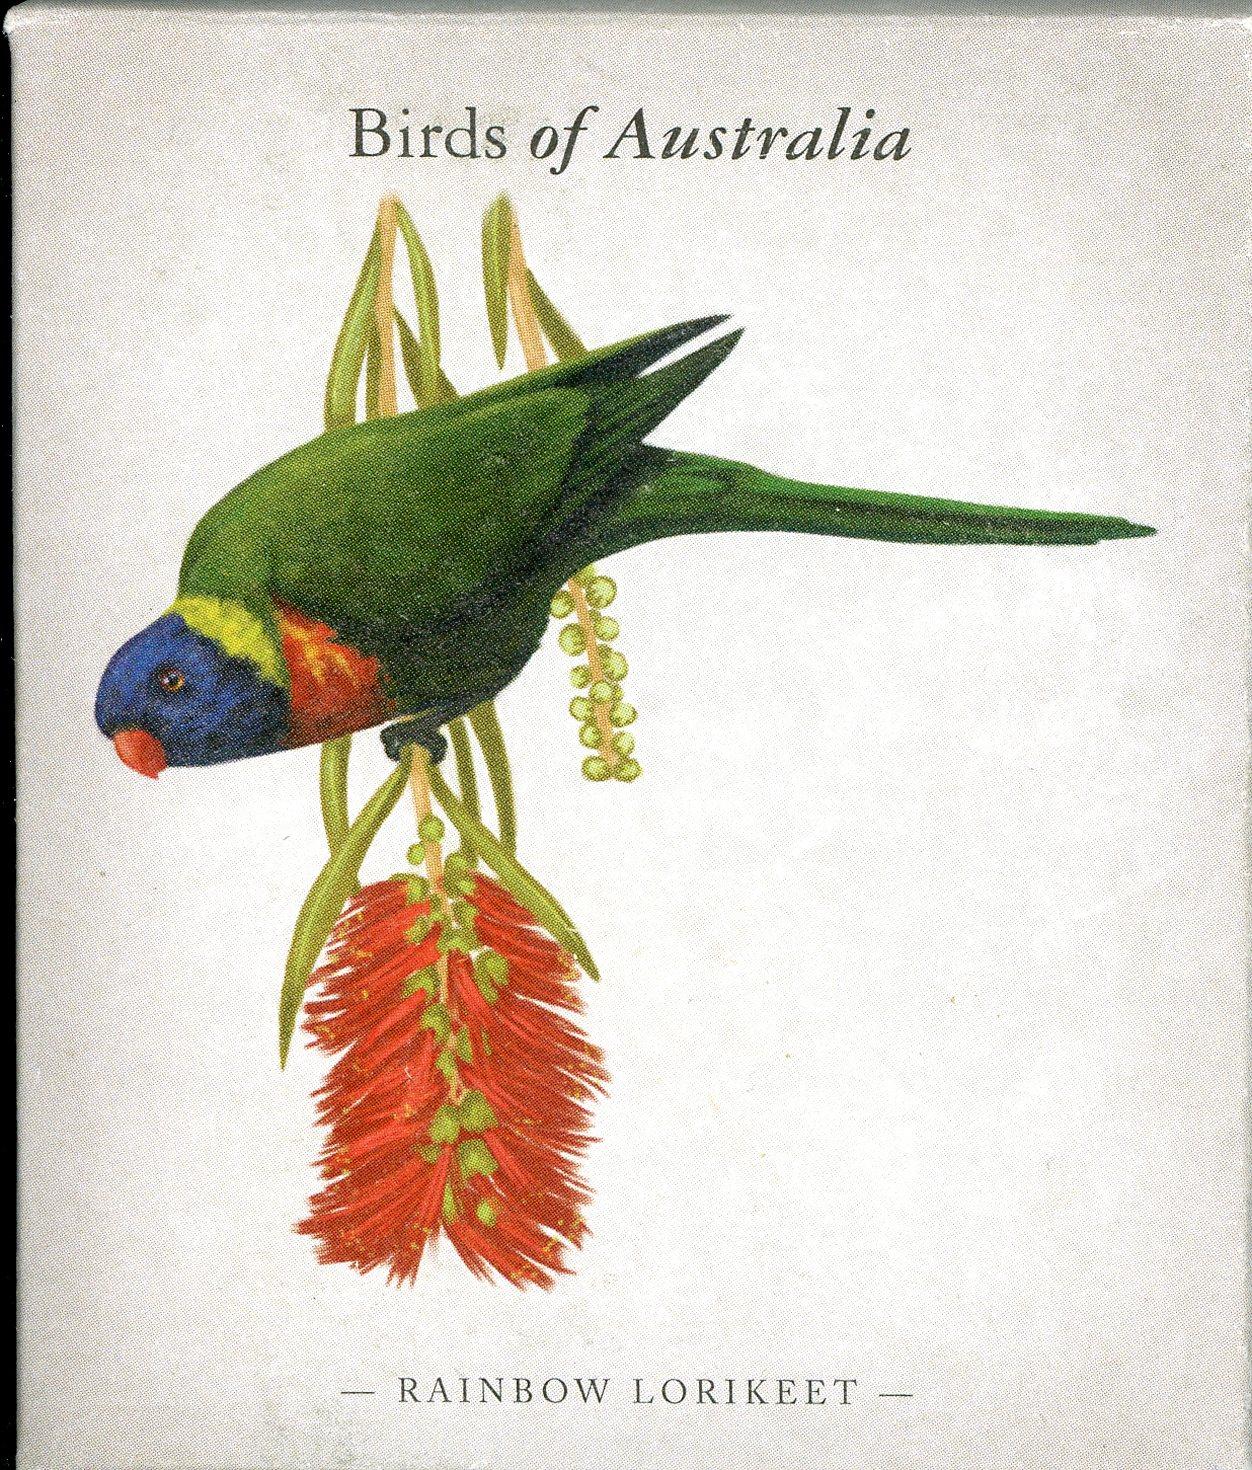 Thumbnail for 2013 Australian Half oz Coloured Silver Proof Birds of Australia - Rainbow Lorikeet